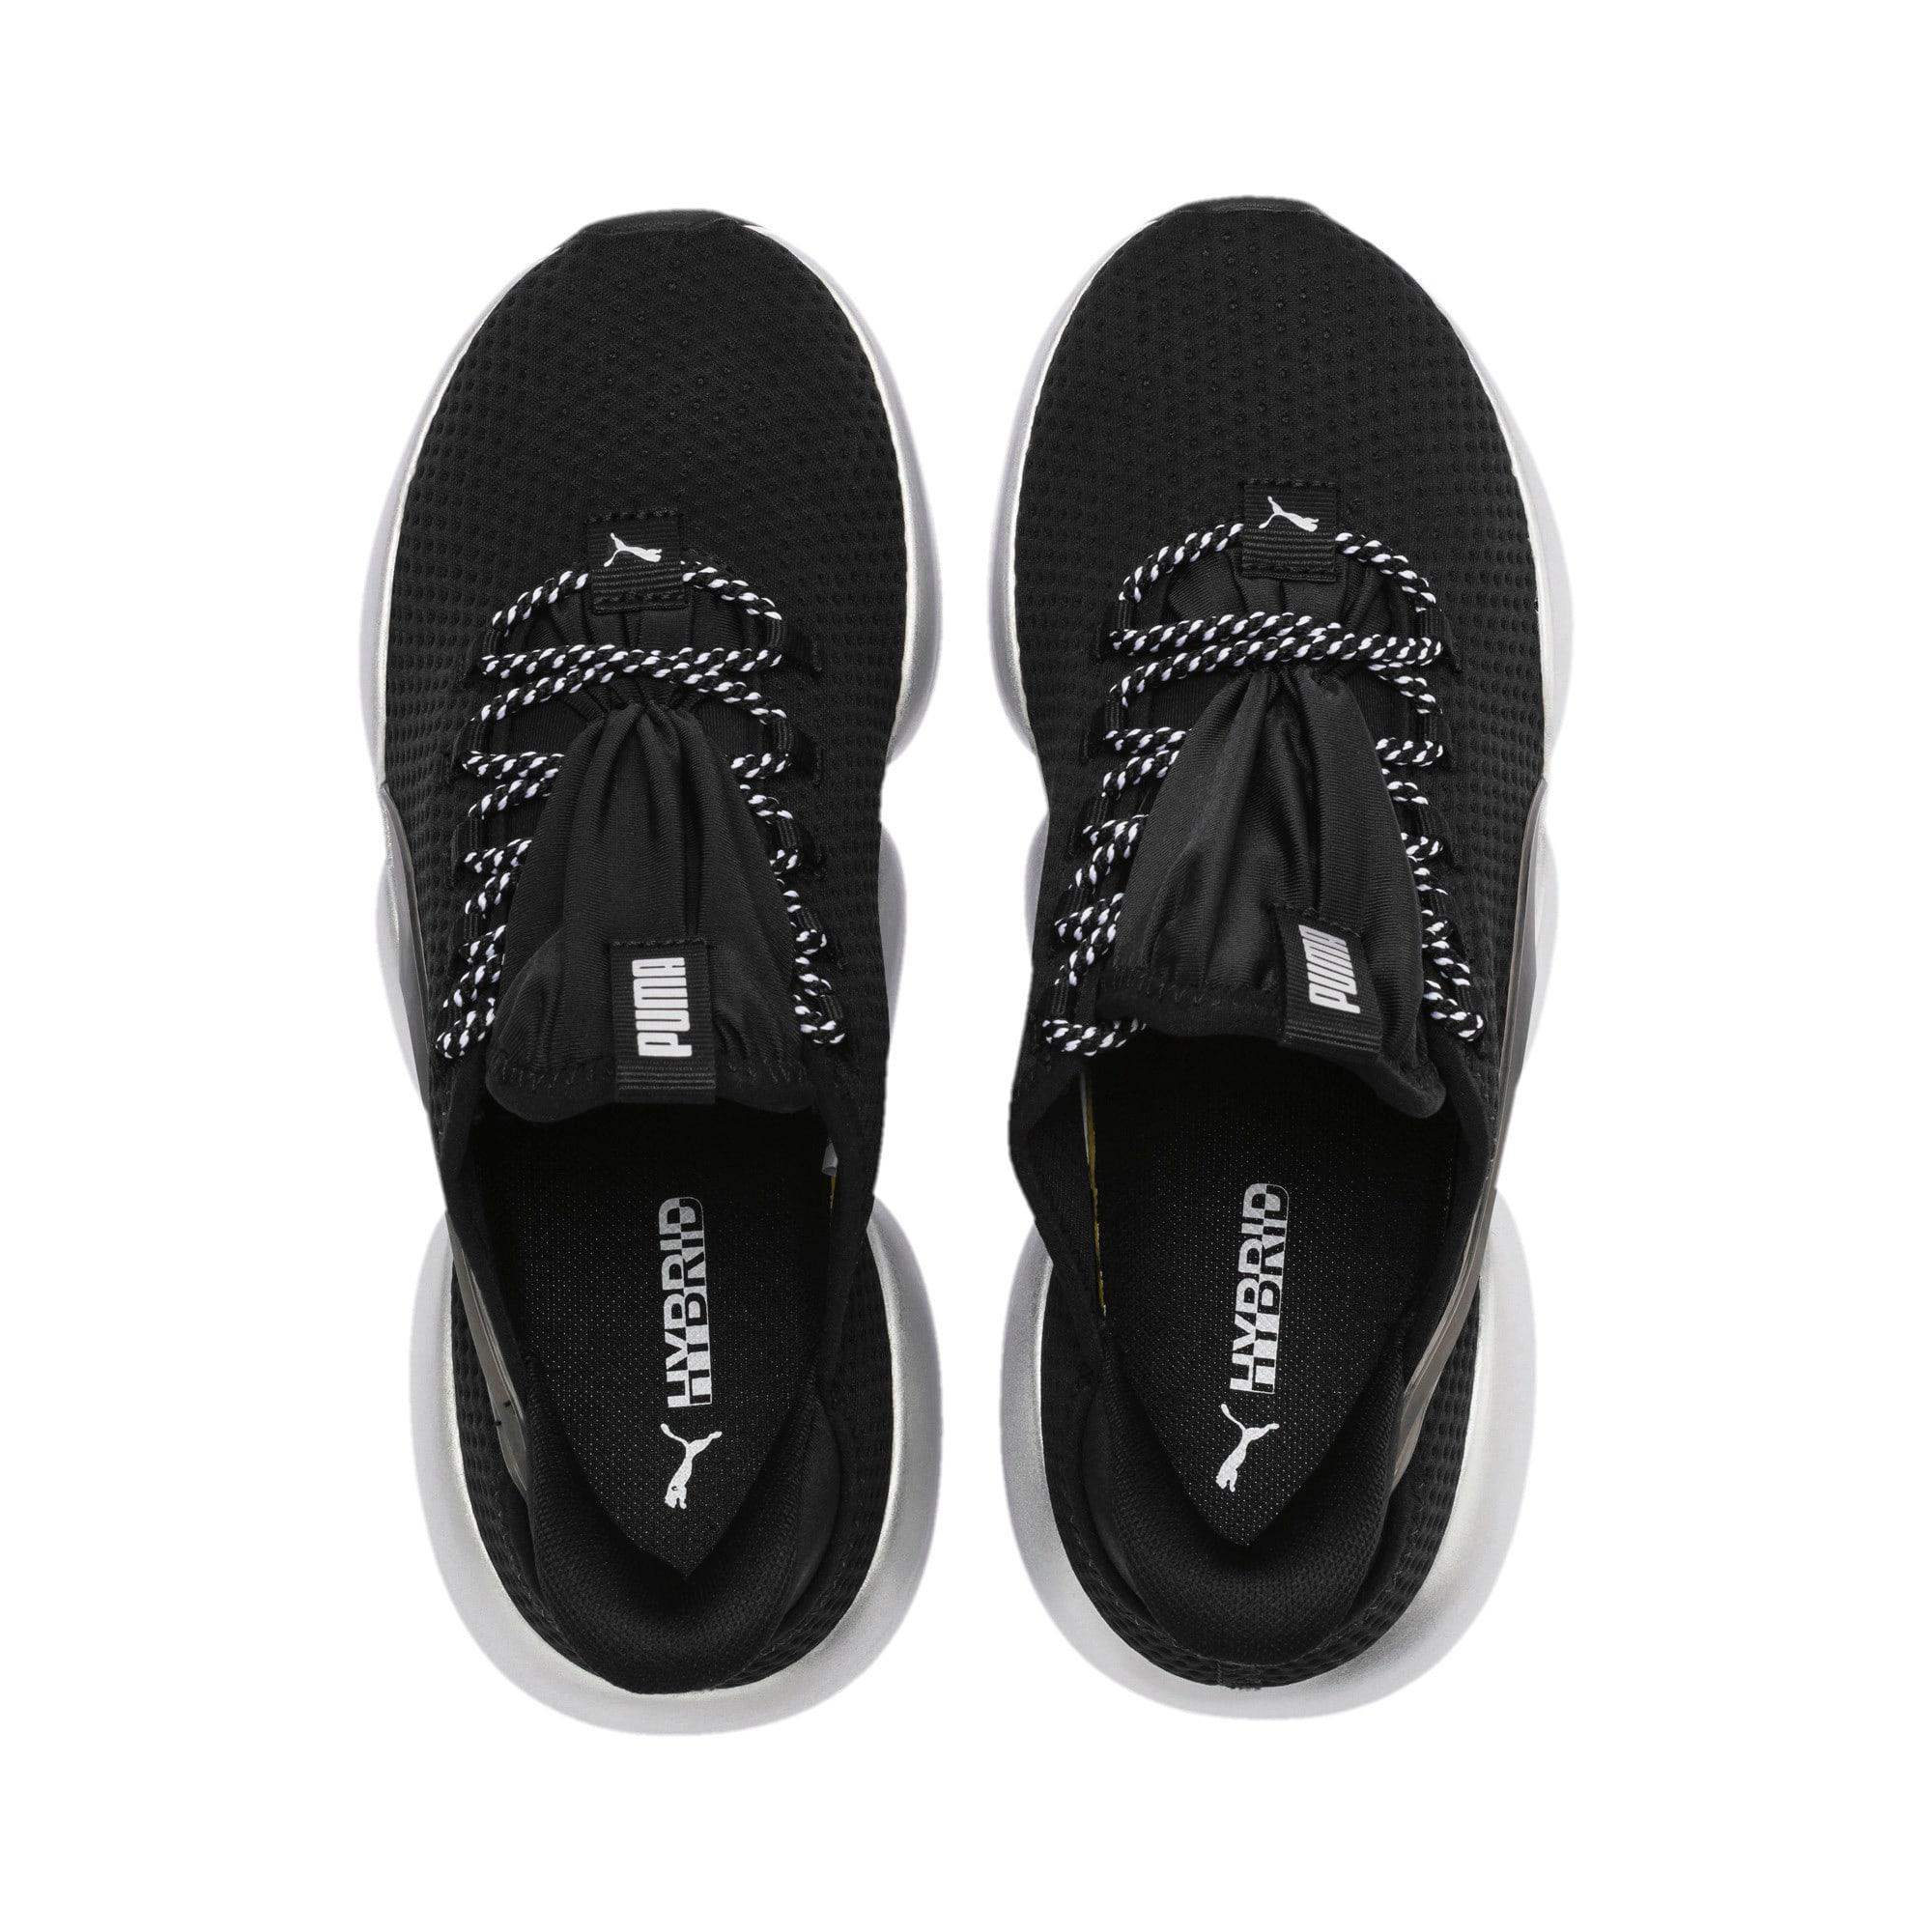 Imagen en miniatura 7 de Zapatillas de training de mujer Mode XT, Puma Black-Puma White, mediana